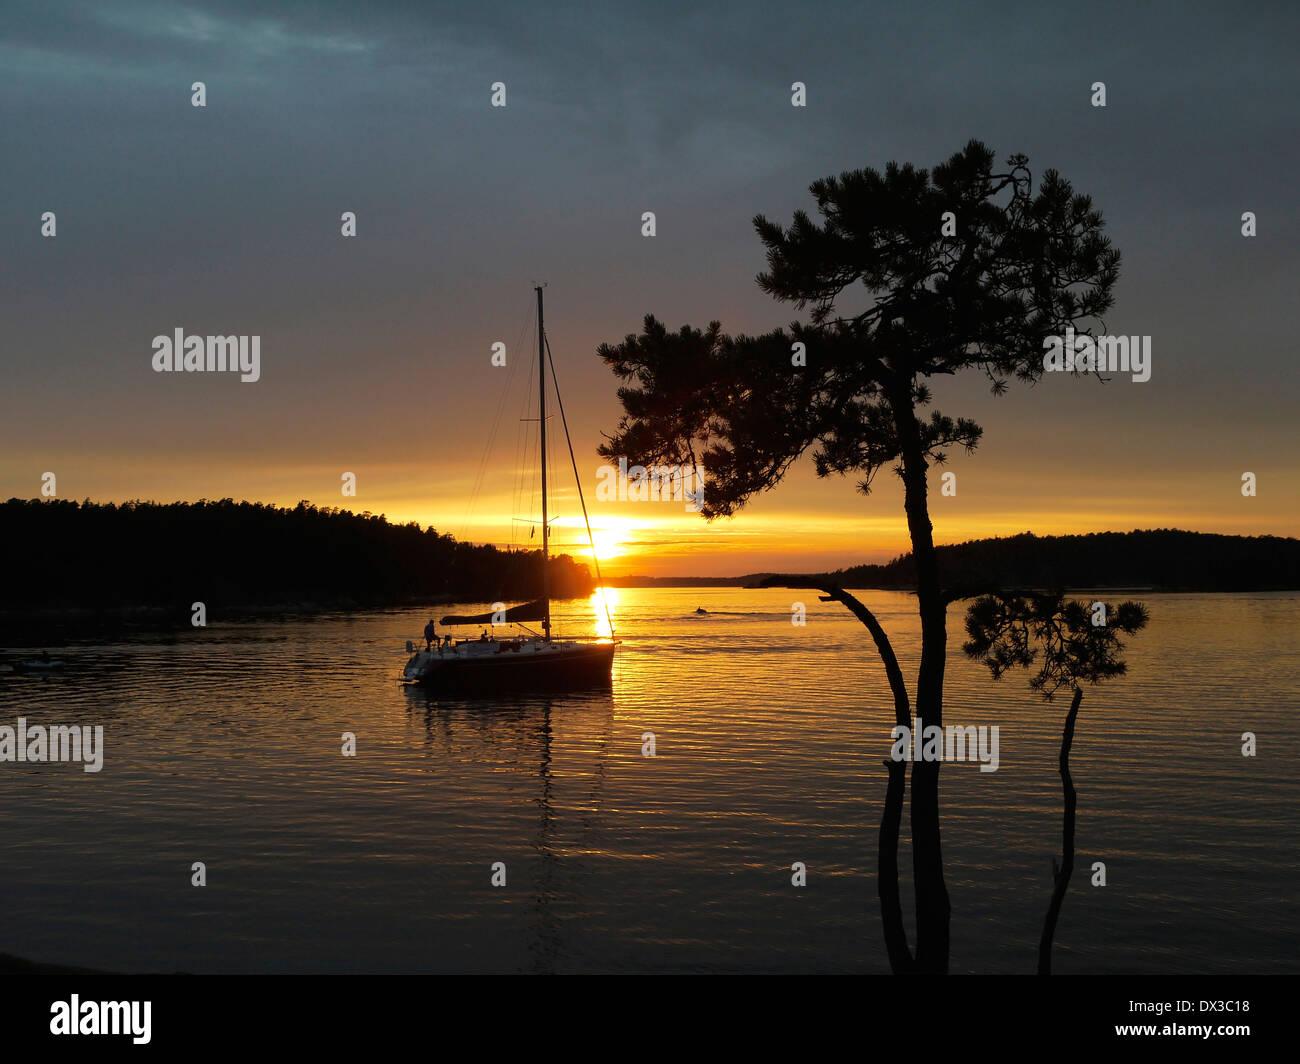 sunset at härsö, stockholm archipelago, stockholms län, sweden - Stock Image